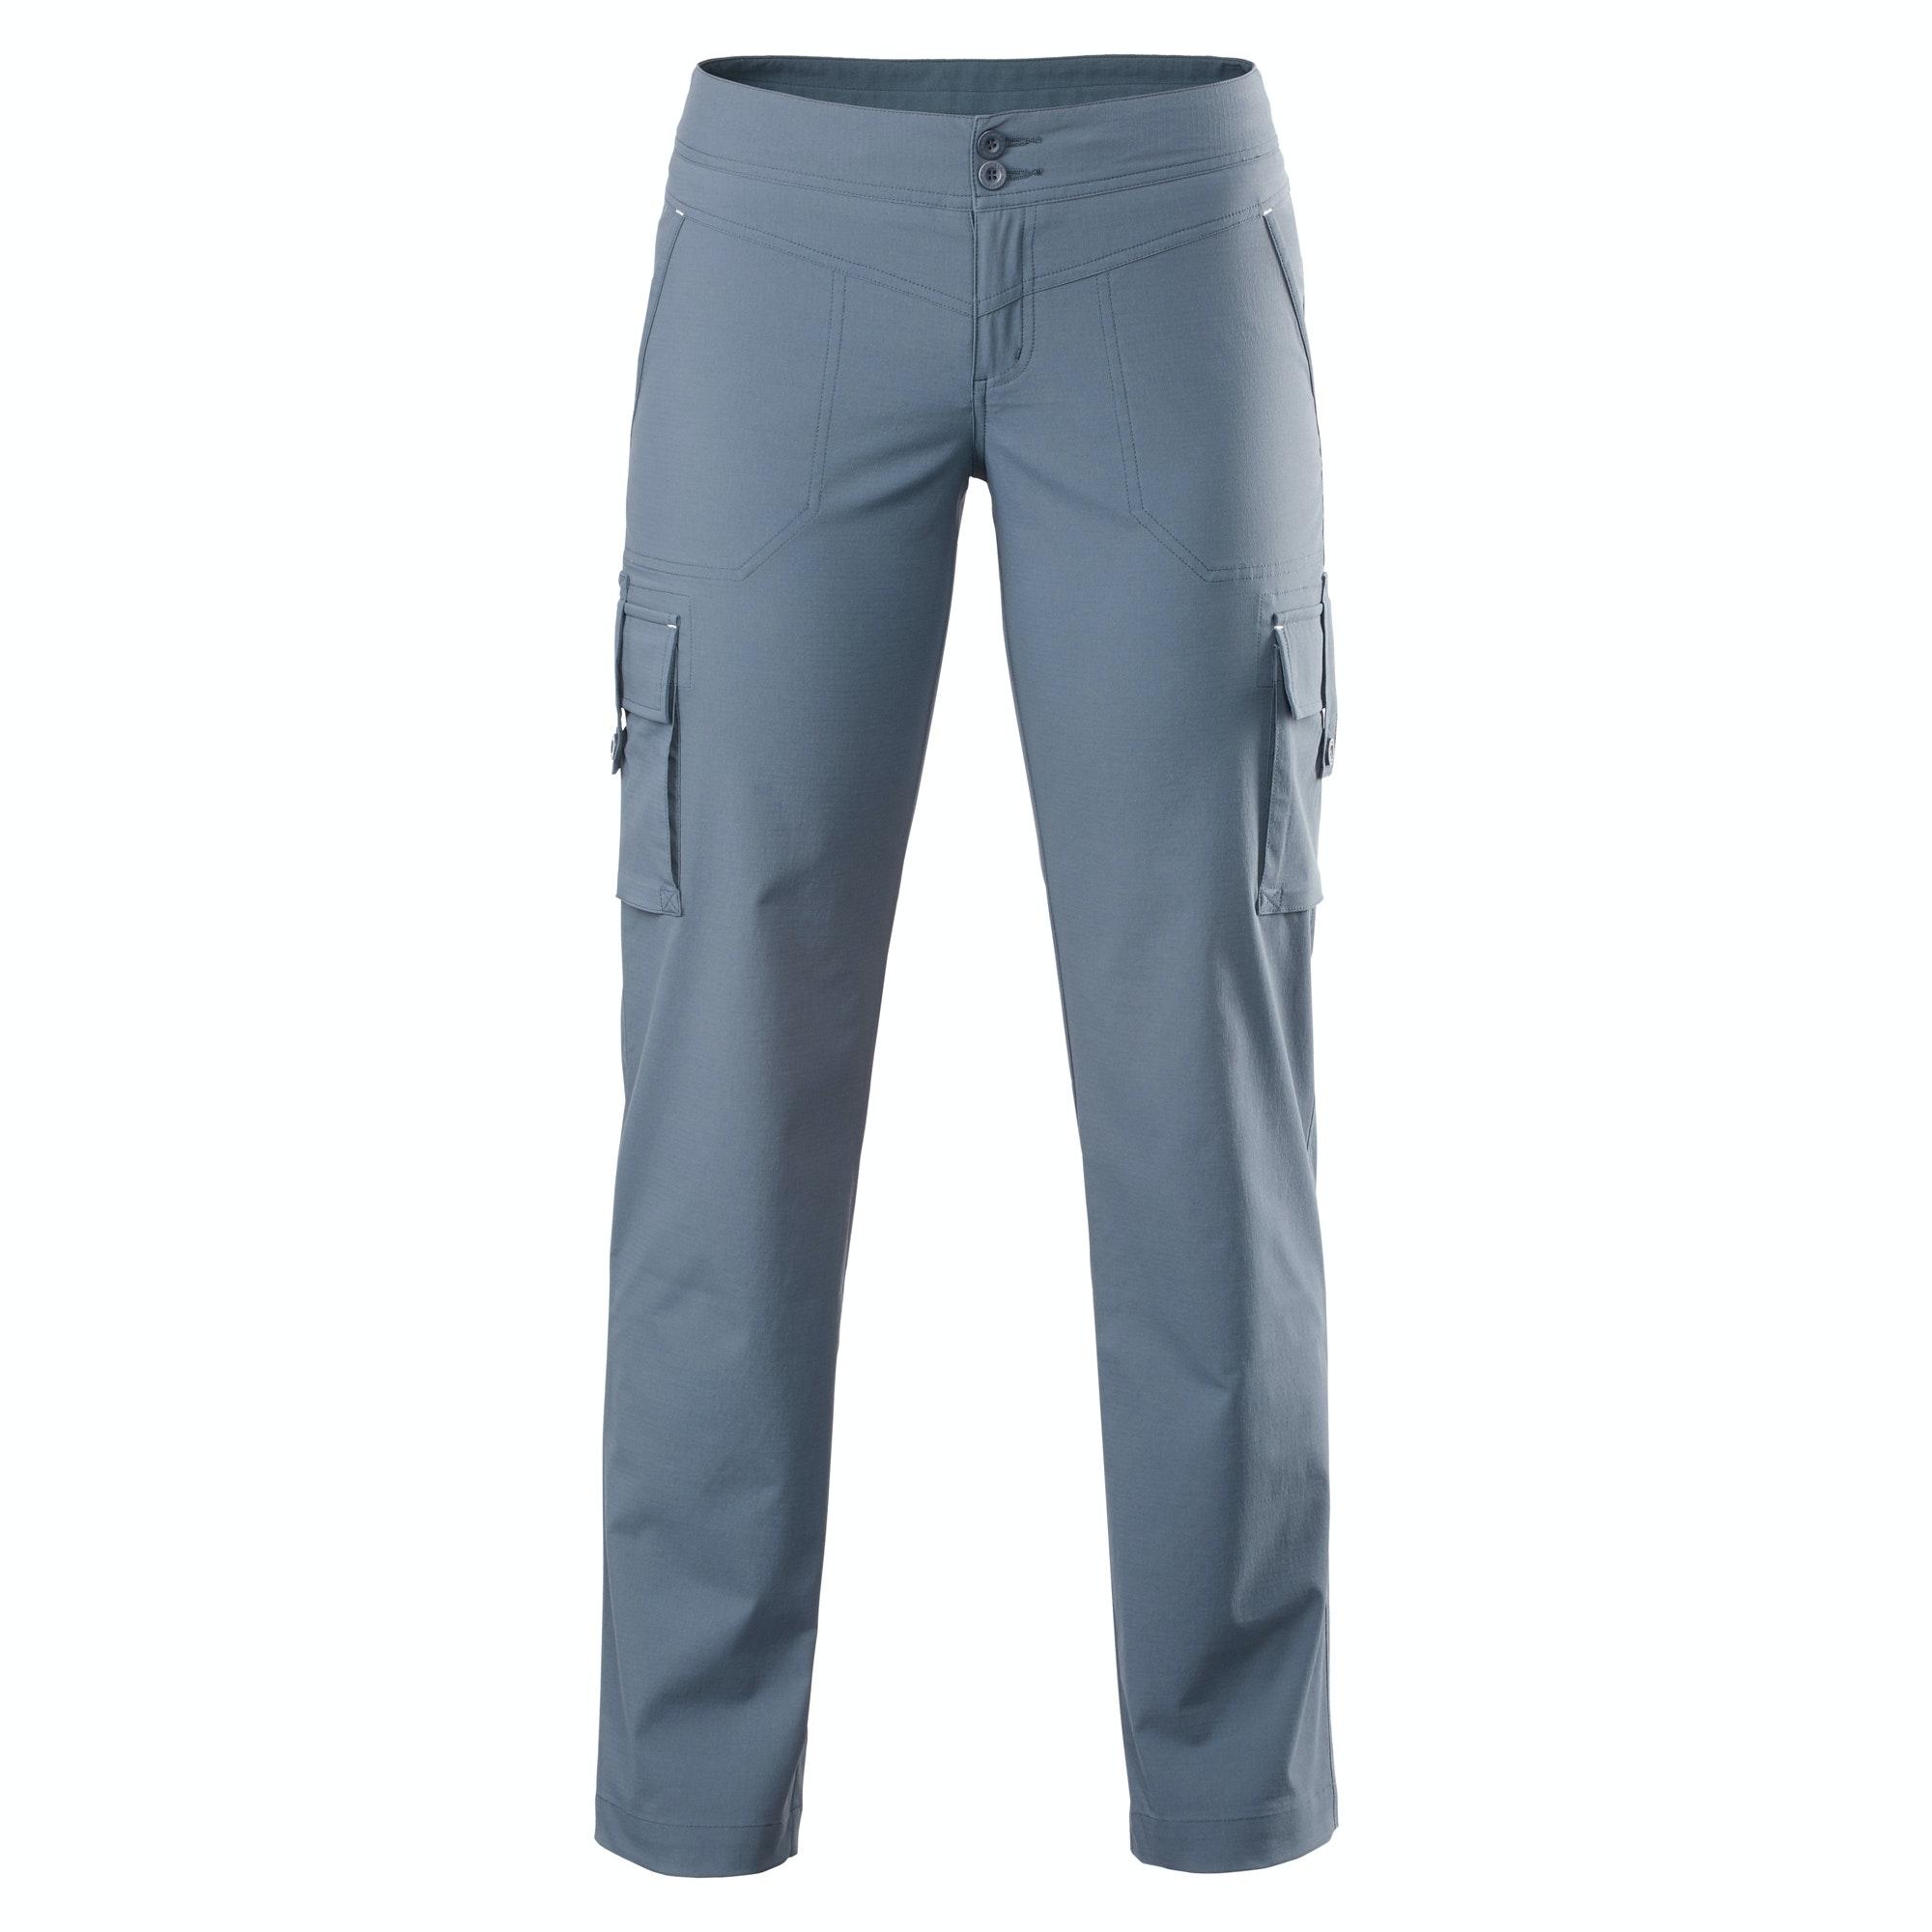 Kathmandu Miro Womens Quick Drying Trousers Camping Hiking Travel ... 72df519f0